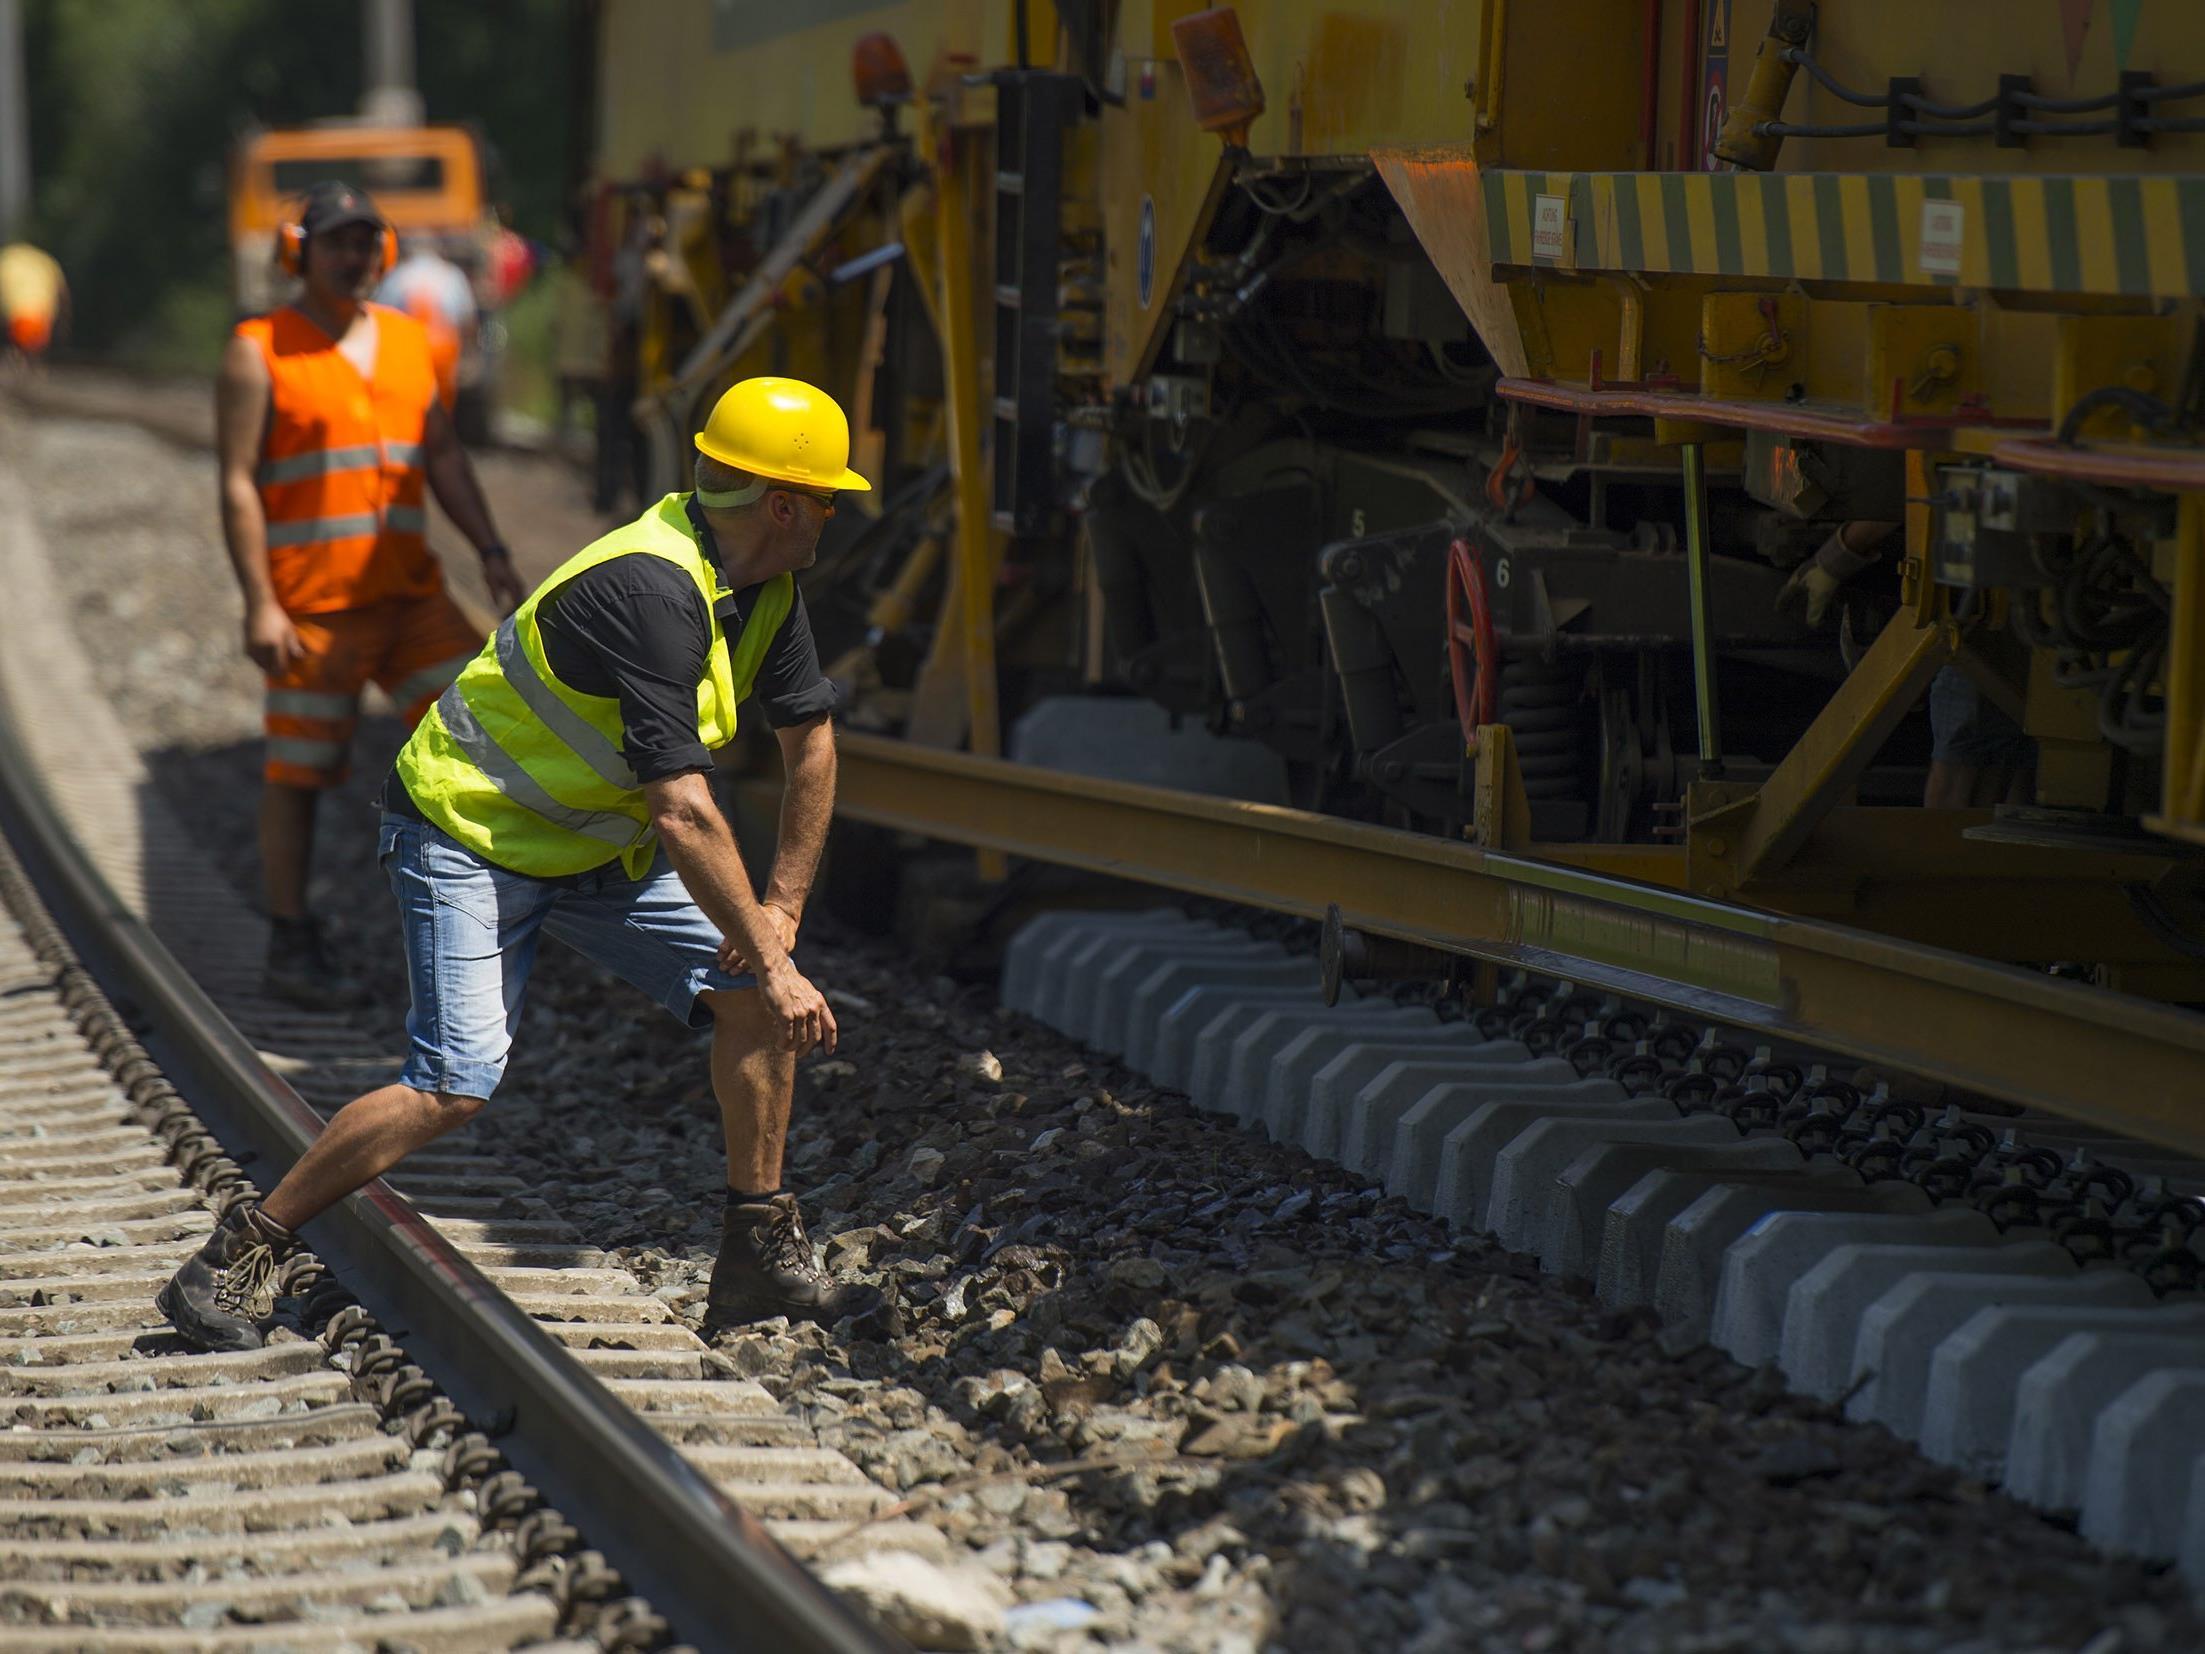 Intensive Bauarbeiten an den Weichen am Bahnhof Lindau HBF